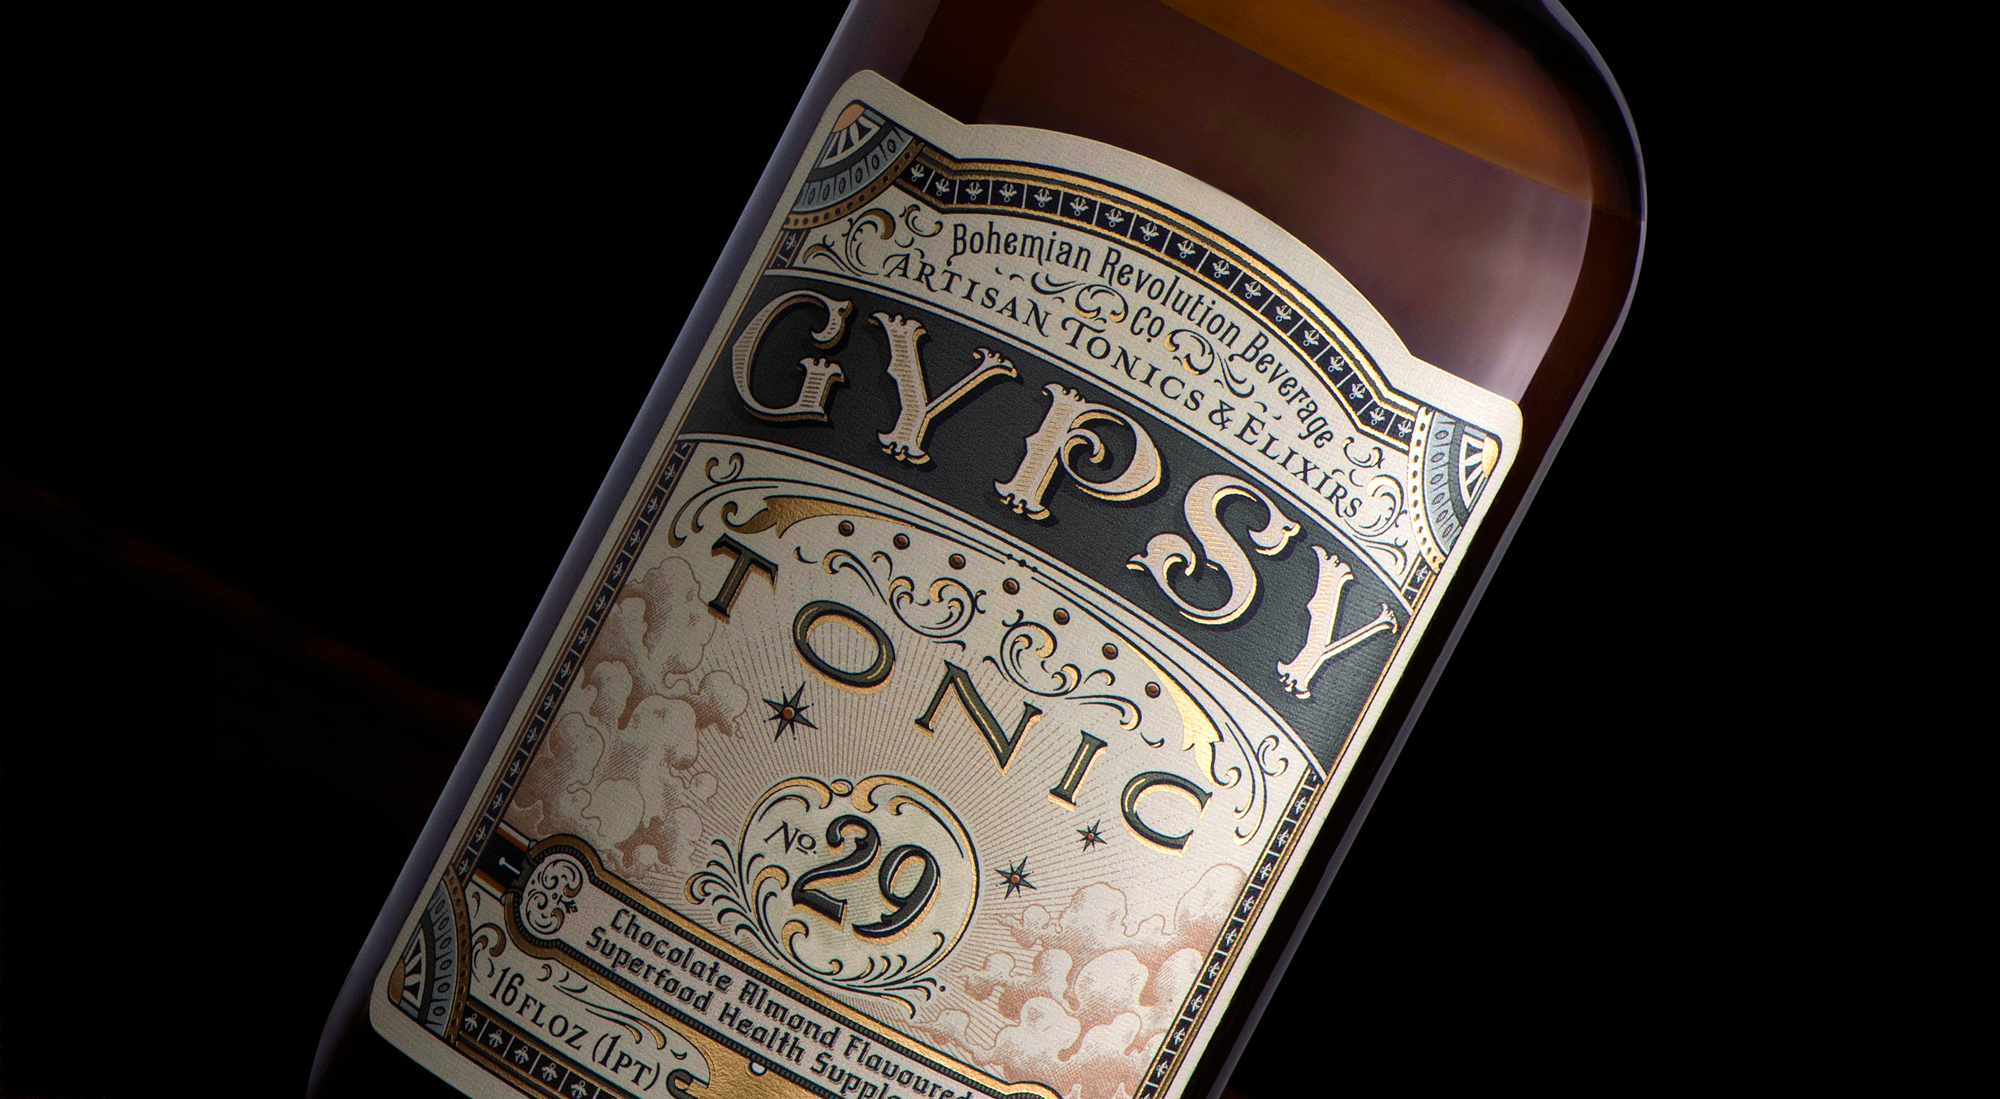 Gypsy Tonic_Close up label _1